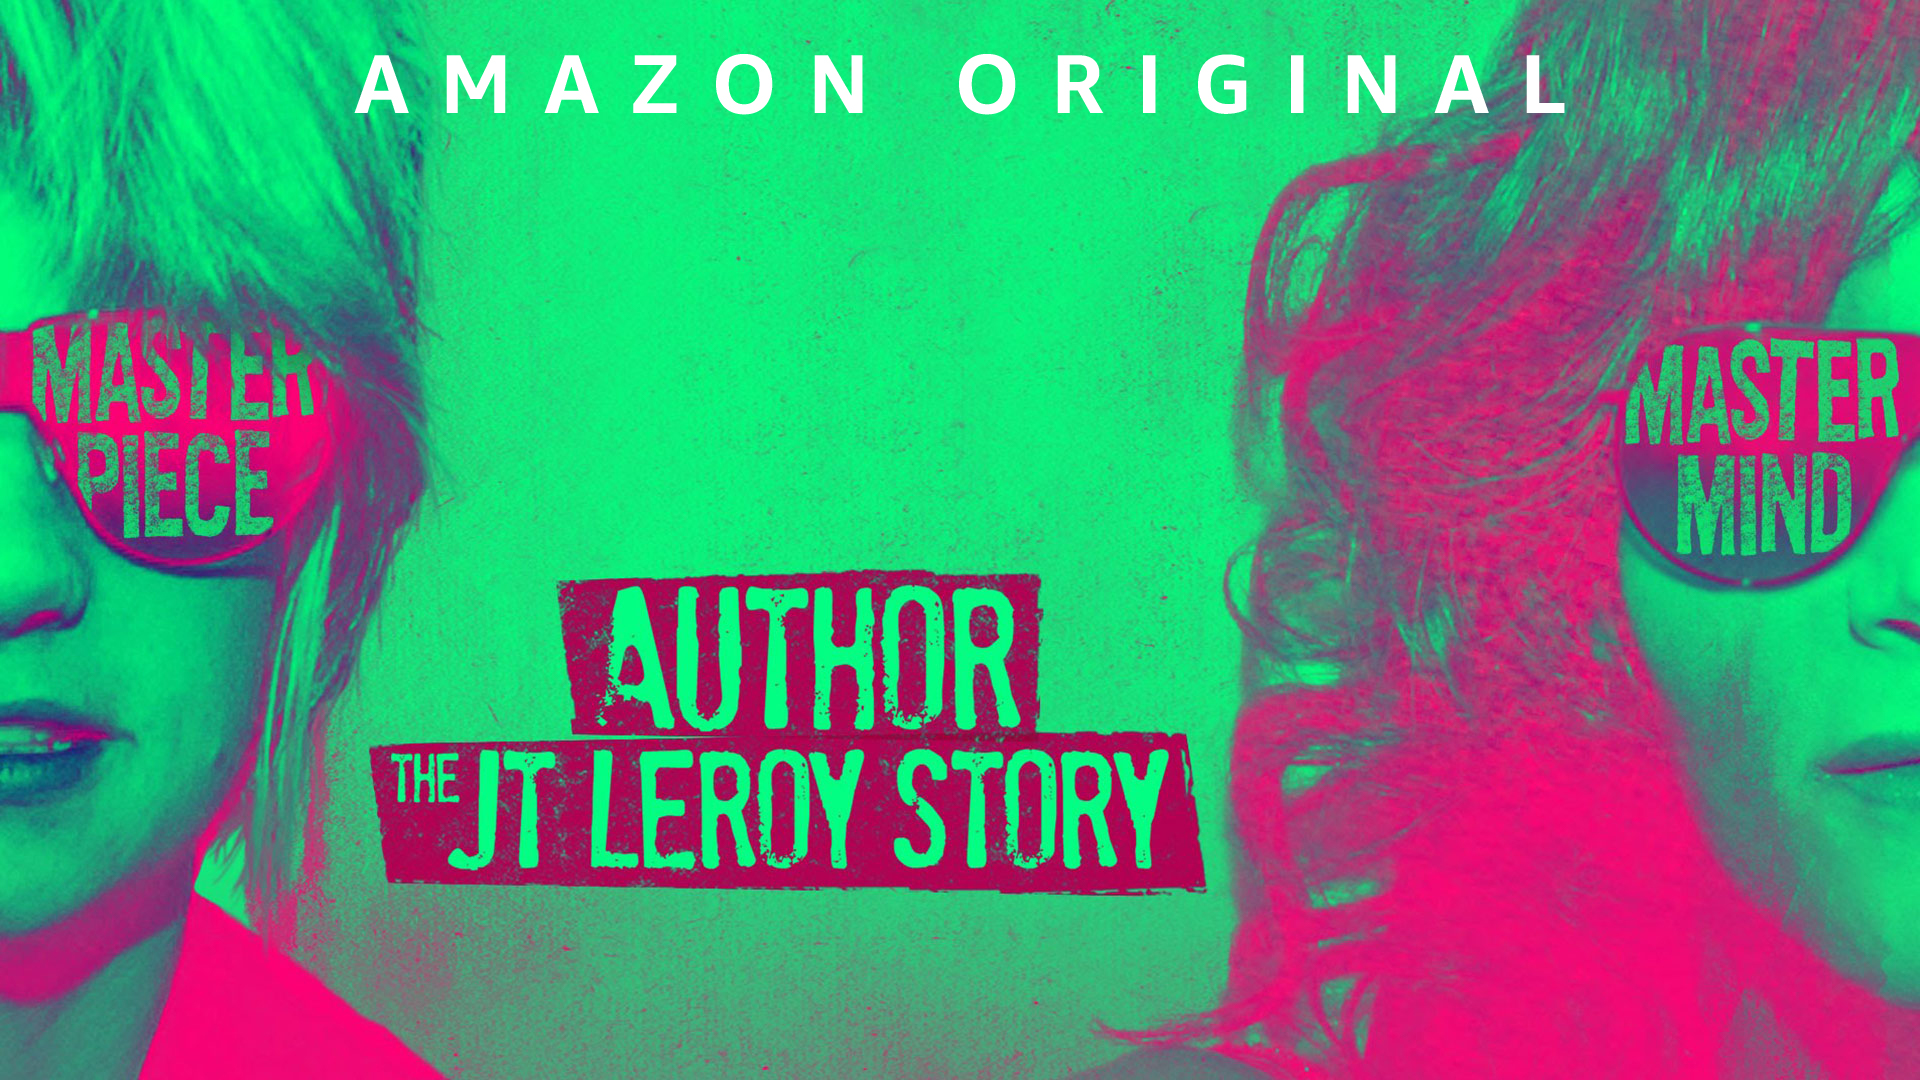 Author The JT LeRoy Story